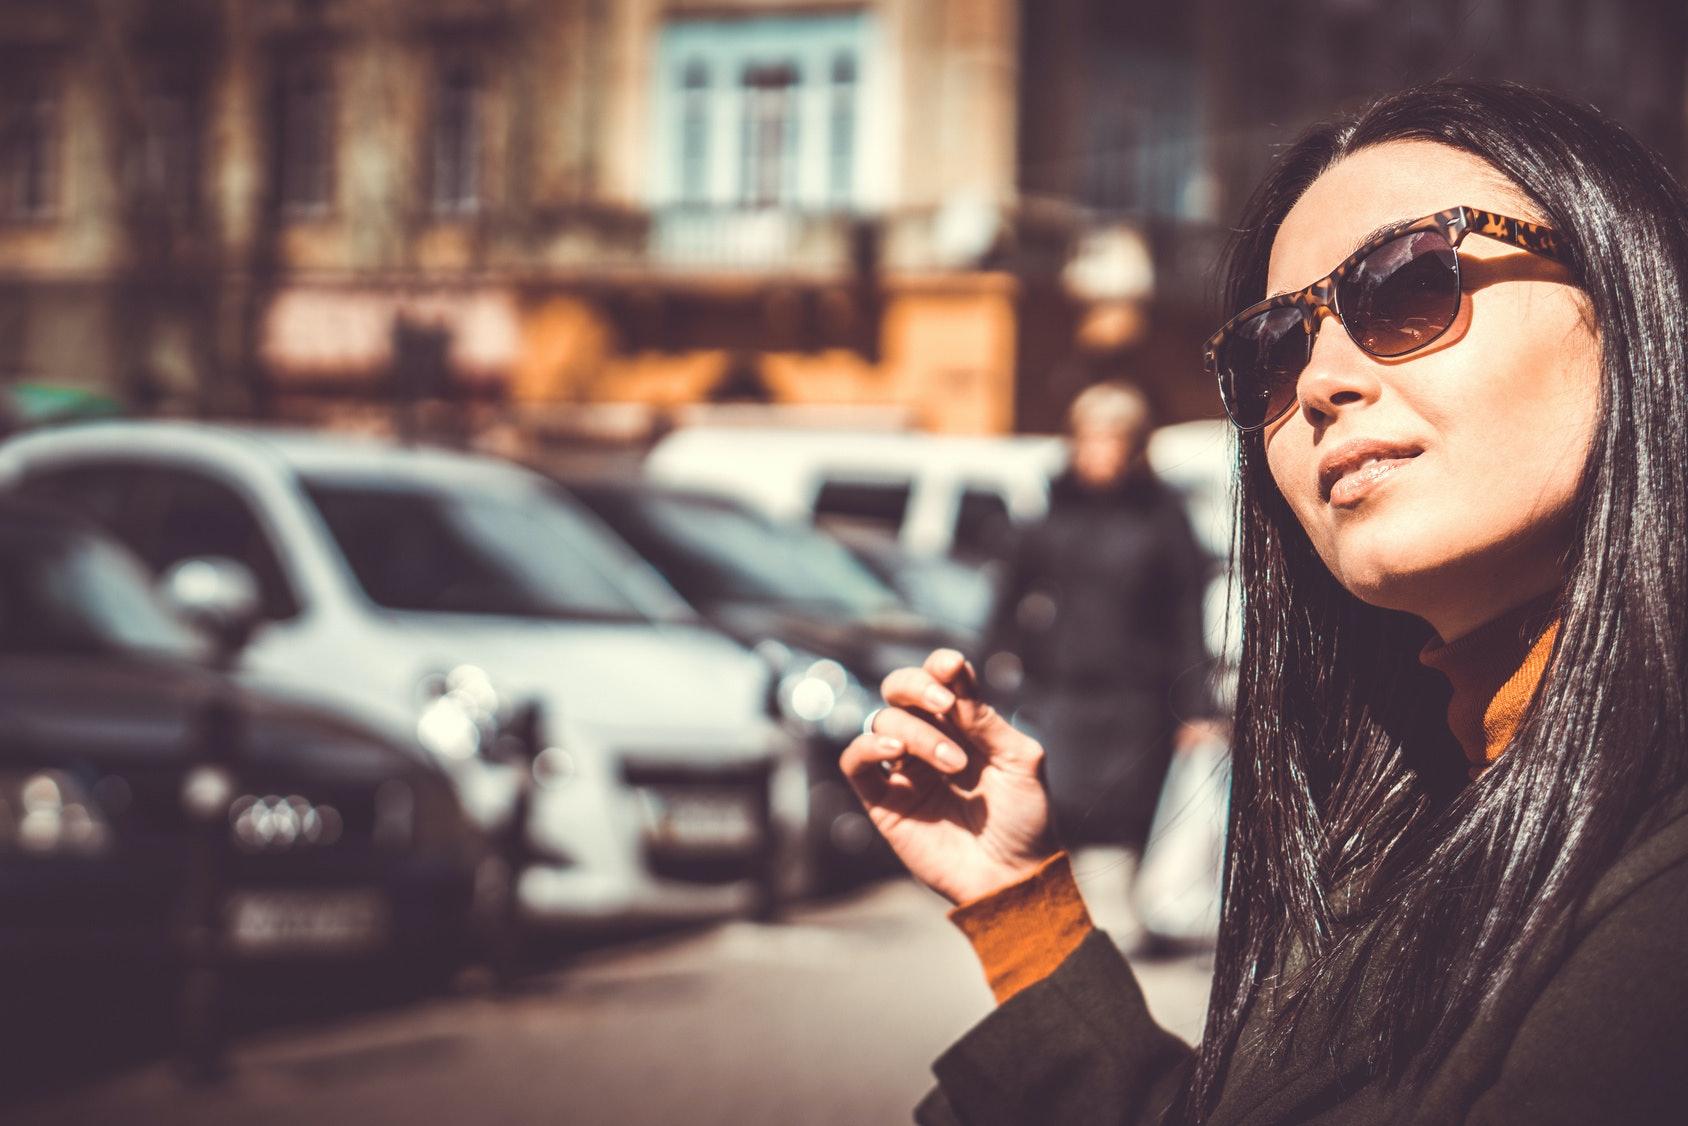 ray ban wayfarer sunglasses fit ray-ban aviators for women